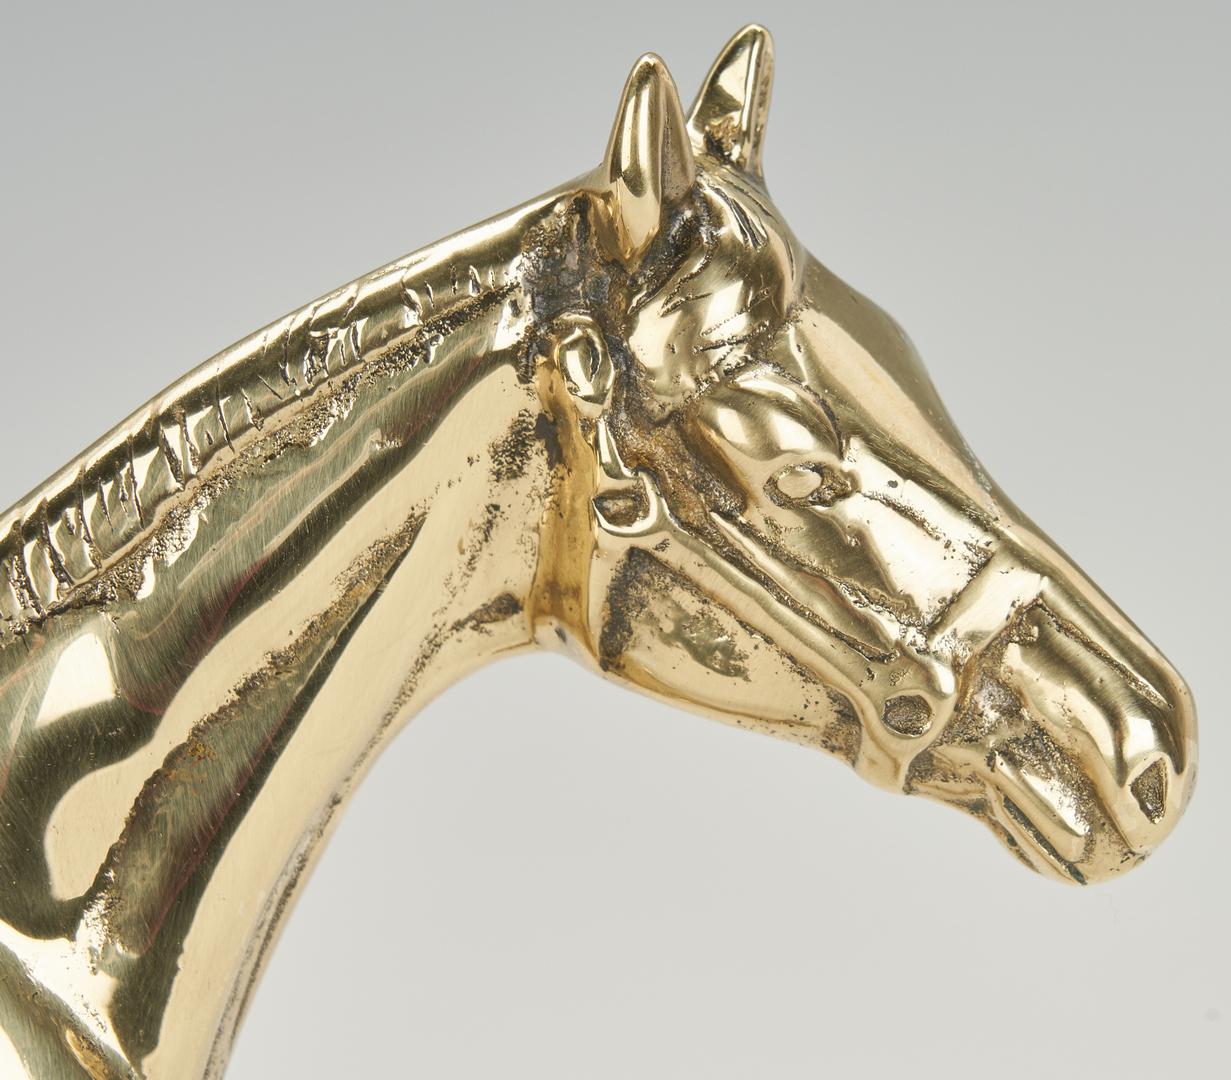 Lot 979: 2 Equestrian Doorstops plus Copper Footed